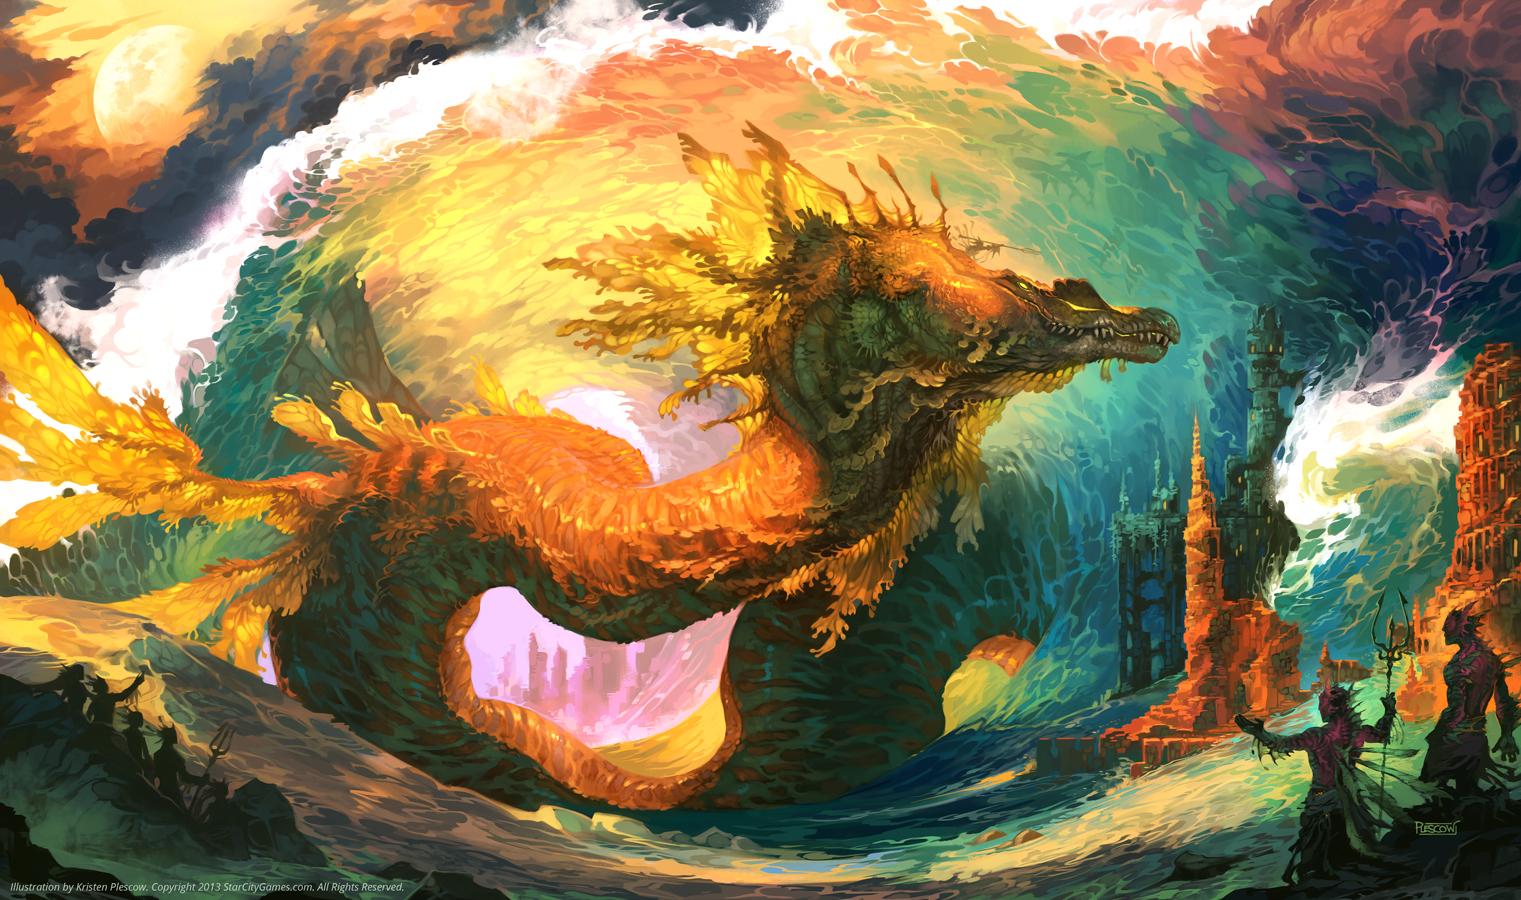 http://fc08.deviantart.net/fs71/f/2013/192/5/5/waves_of_power_by_kristenplescow-d6d3bnh.jpg